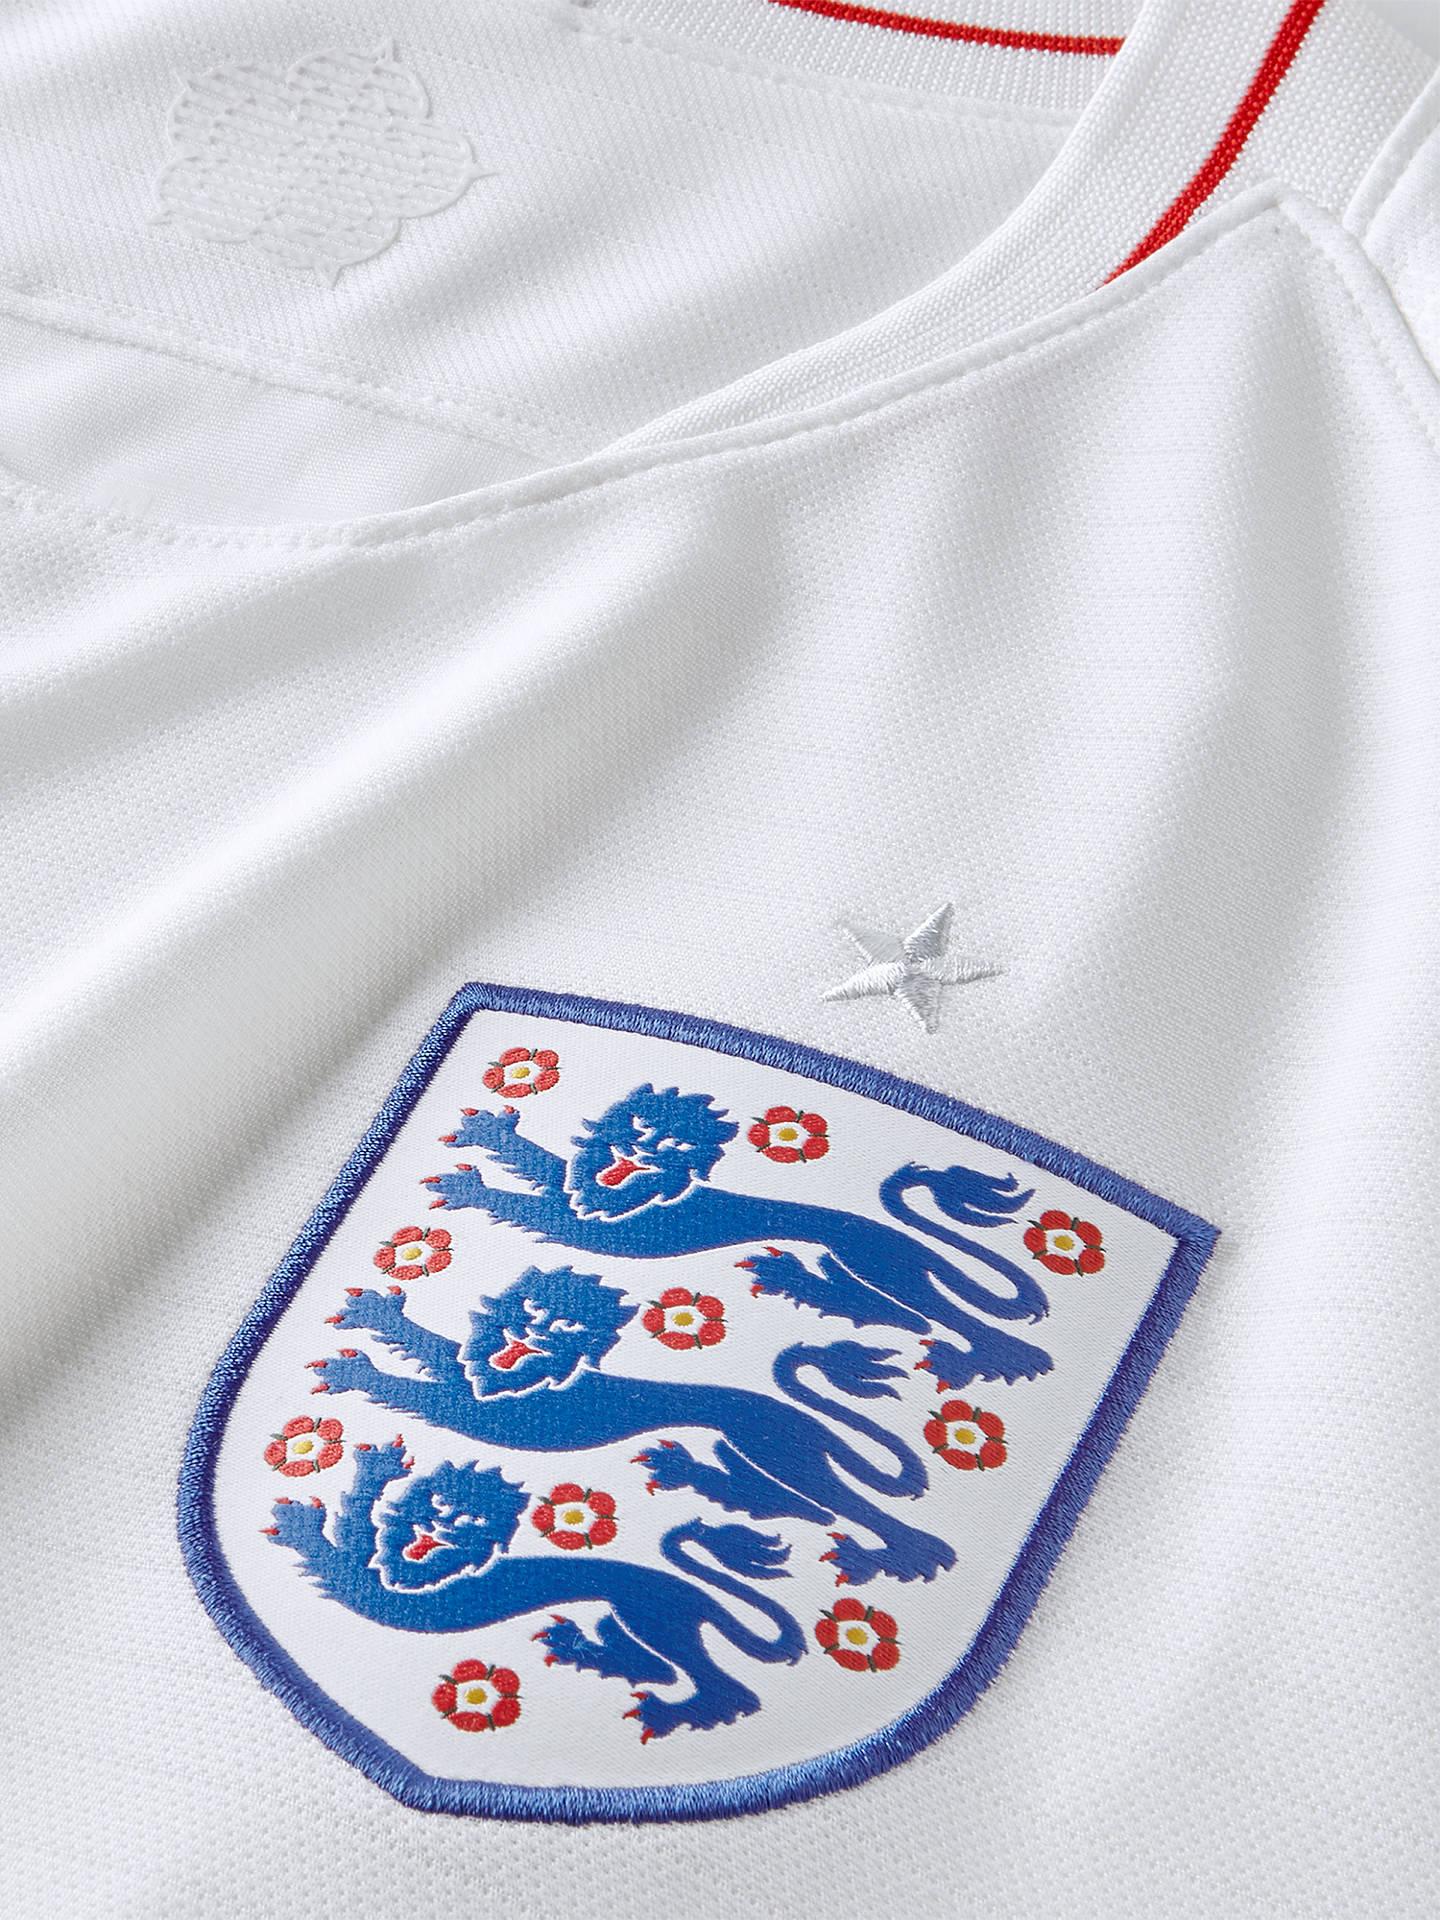 a0ddafea1e27 ... Buy Nike 2018 England Stadium Kit Men s Football Shirt